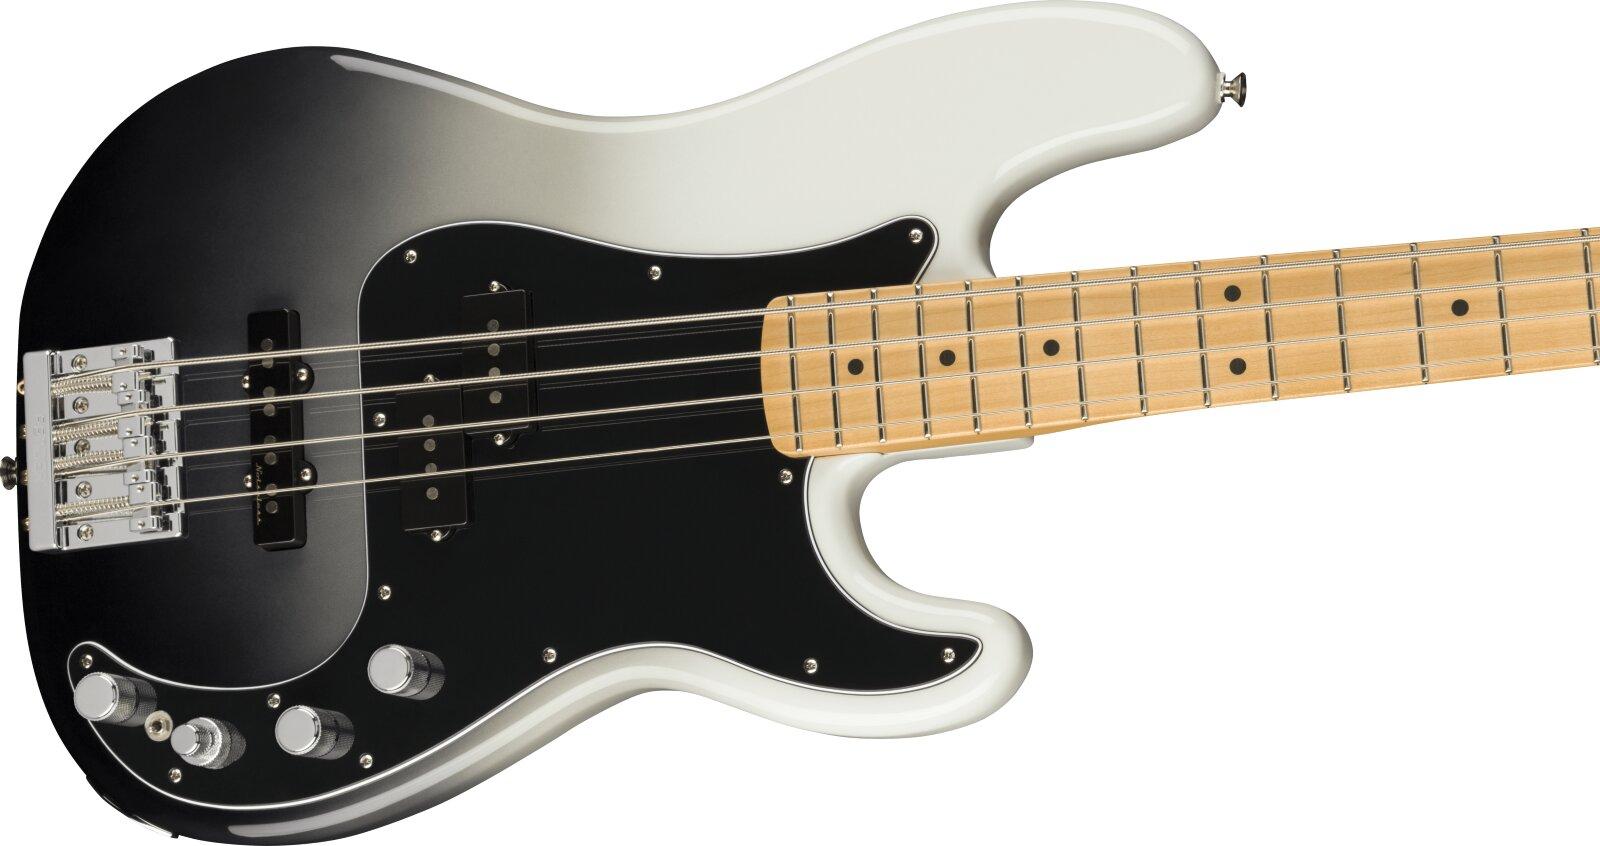 Fender Player Plus Precision Bass, Maple Fingerboard, Silver Smoke : photo 3